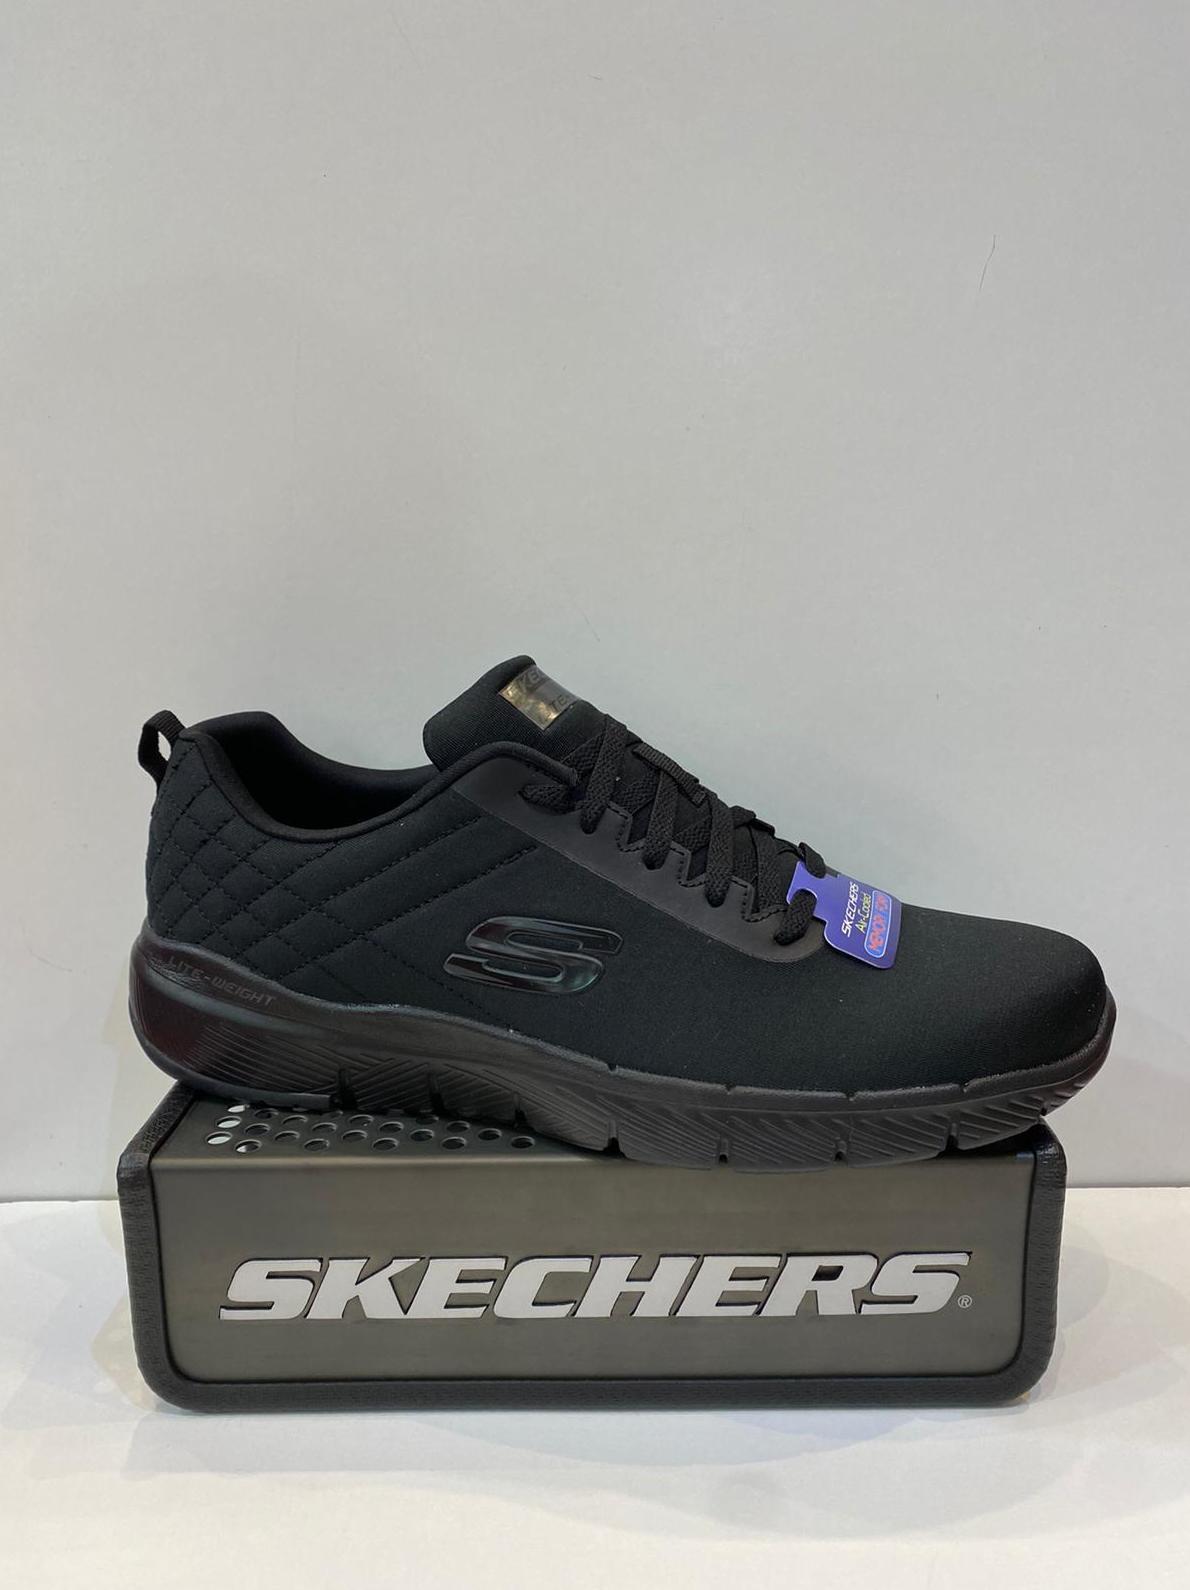 Sabata esportiva d'home, de la marca Skechers, de pneopré, plantilla Memory Foam Air-Colled, sola de resalite 69.95€